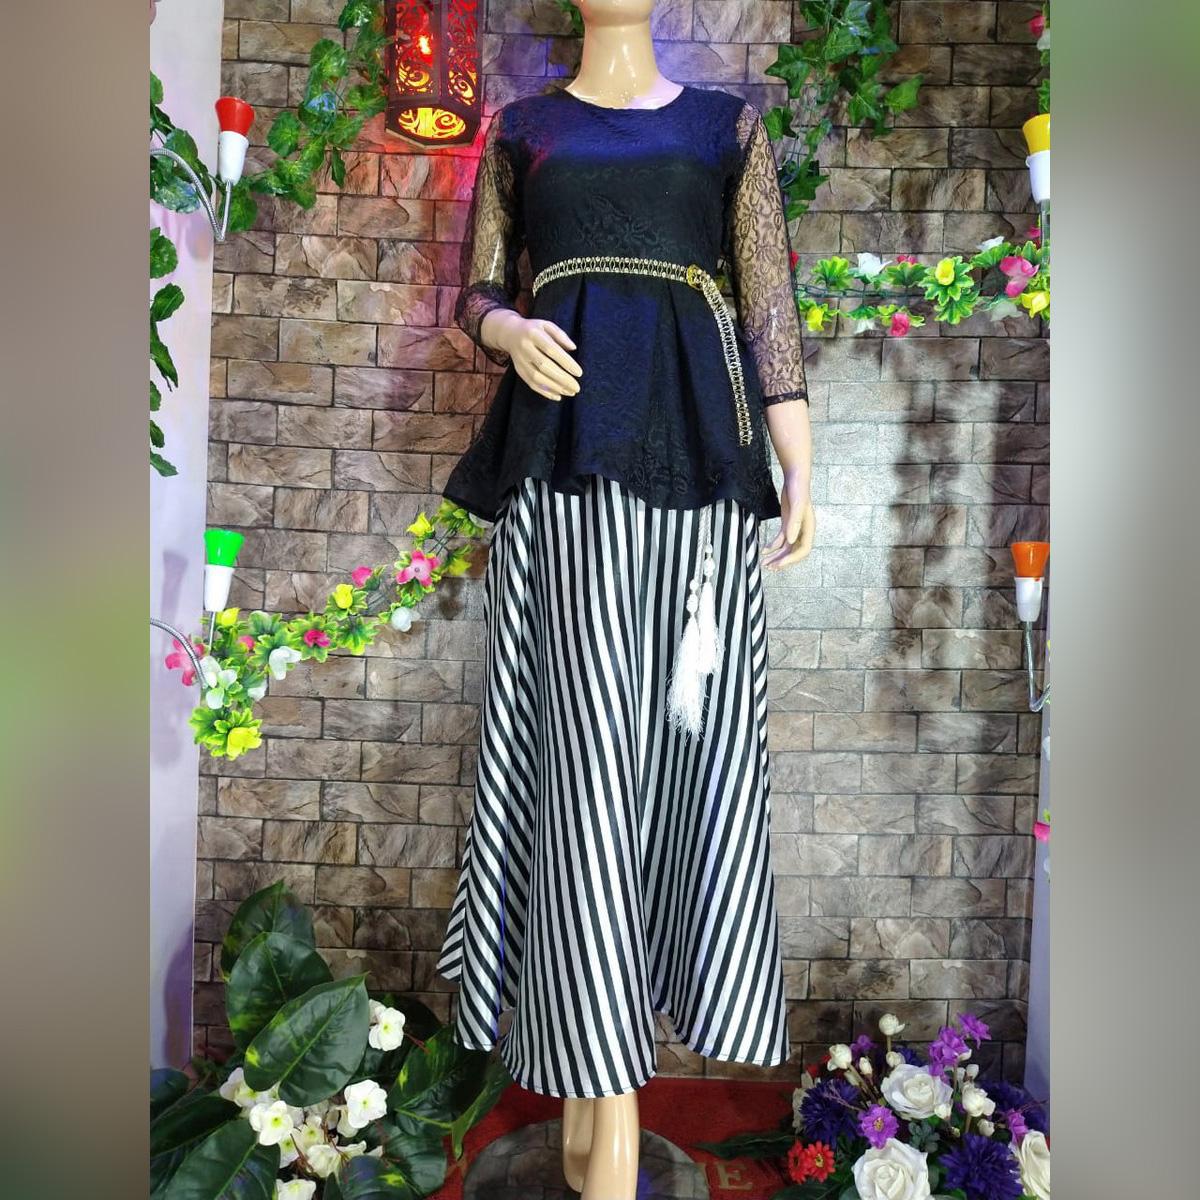 Trendz.pk Black Silk Skirt with Net Top  for Ladies  girls! SK-007